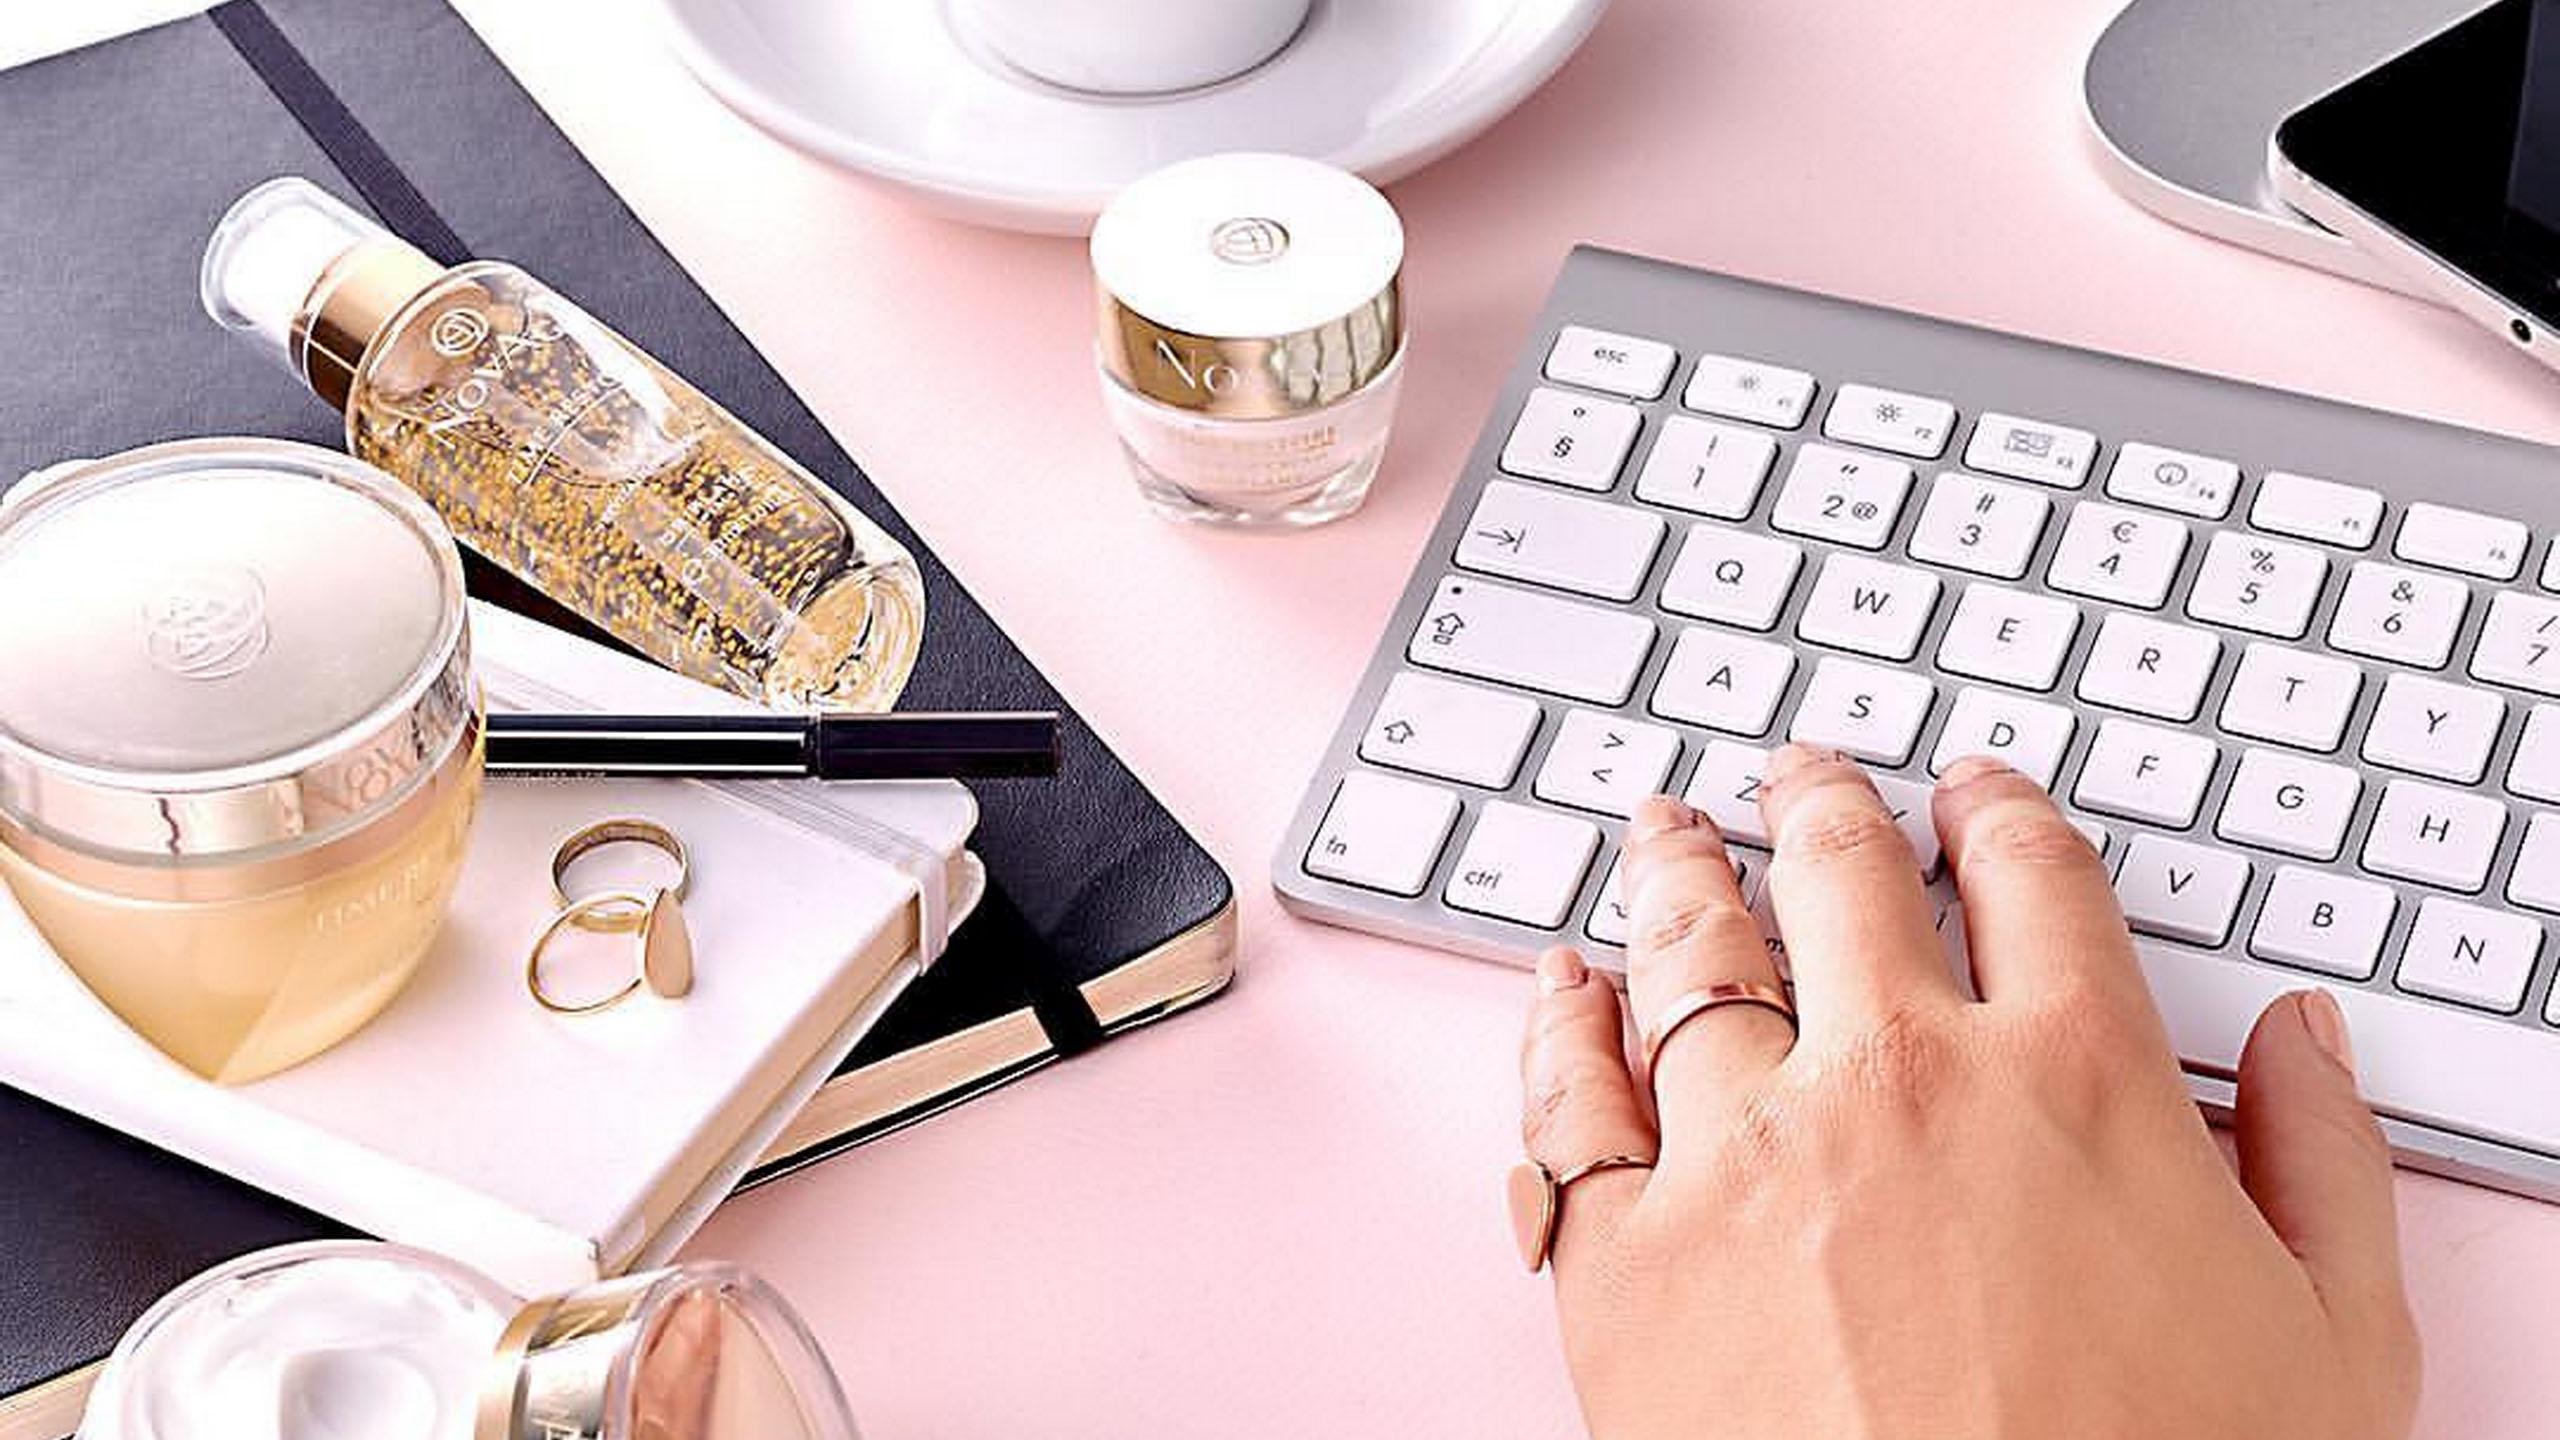 Cara Kerja Oriflame Online | Mudah Bisa Bisnis Kapan ...